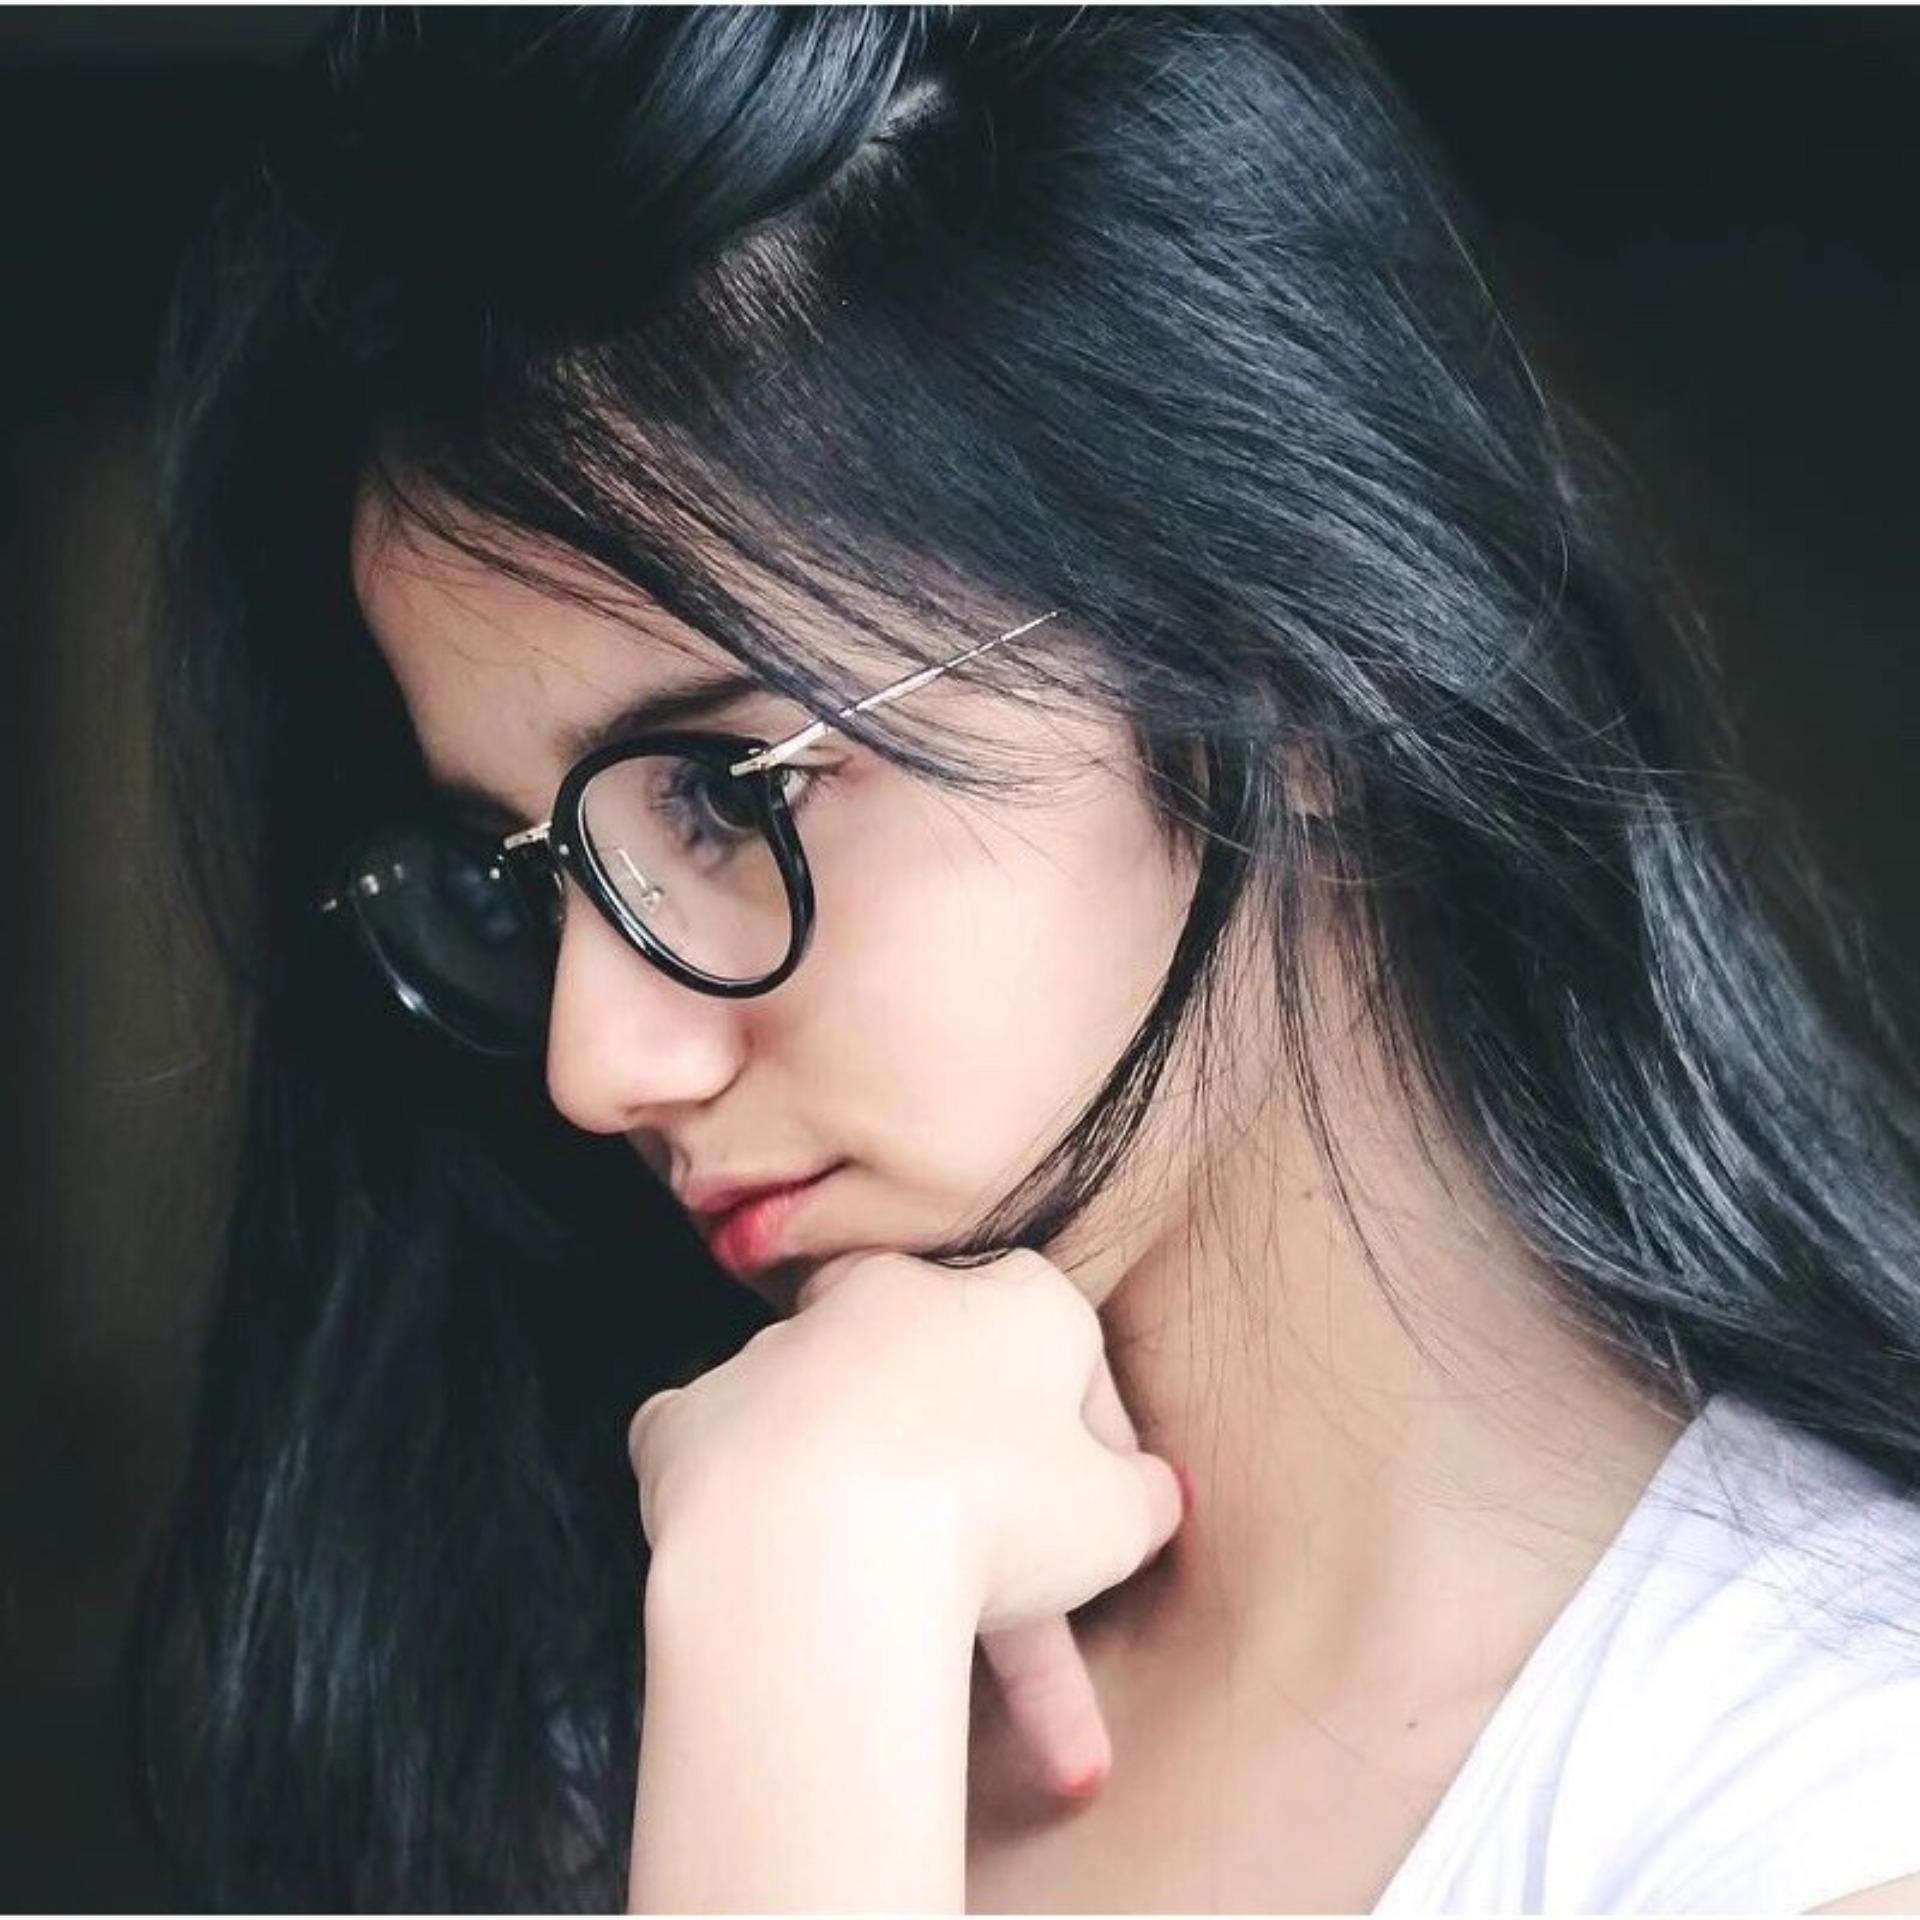 Kacamata Pria Wanita Lenon Metal Black Timely High Quality Charming Womens Round Clear Lens Glasses Sun 4480